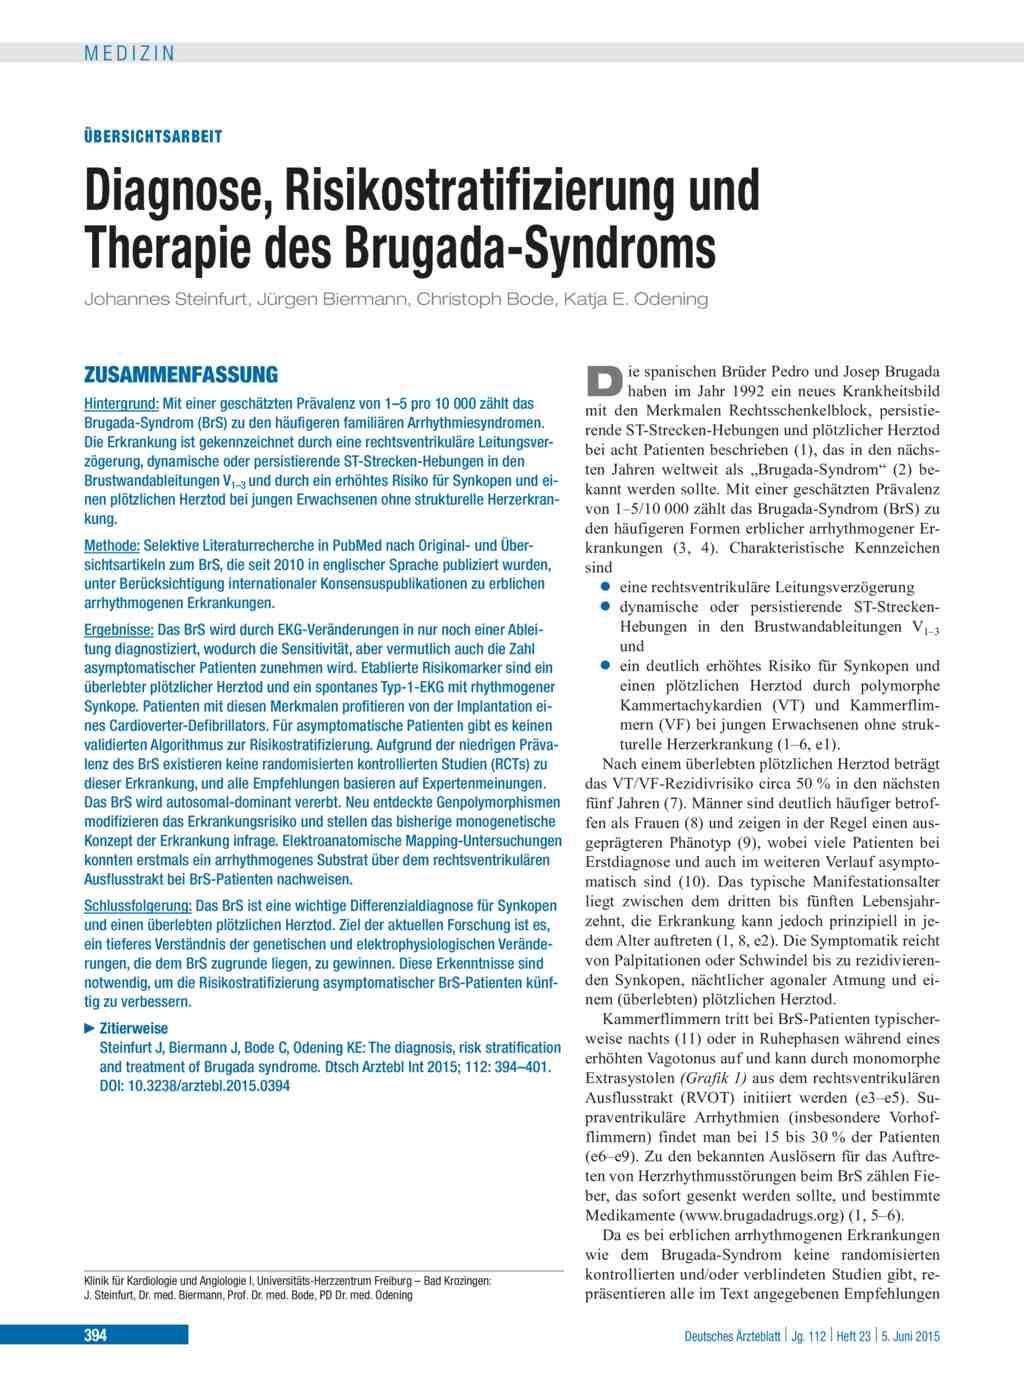 Diagnose, Risikostratifizierung und Therapie des Brugada-Syndroms